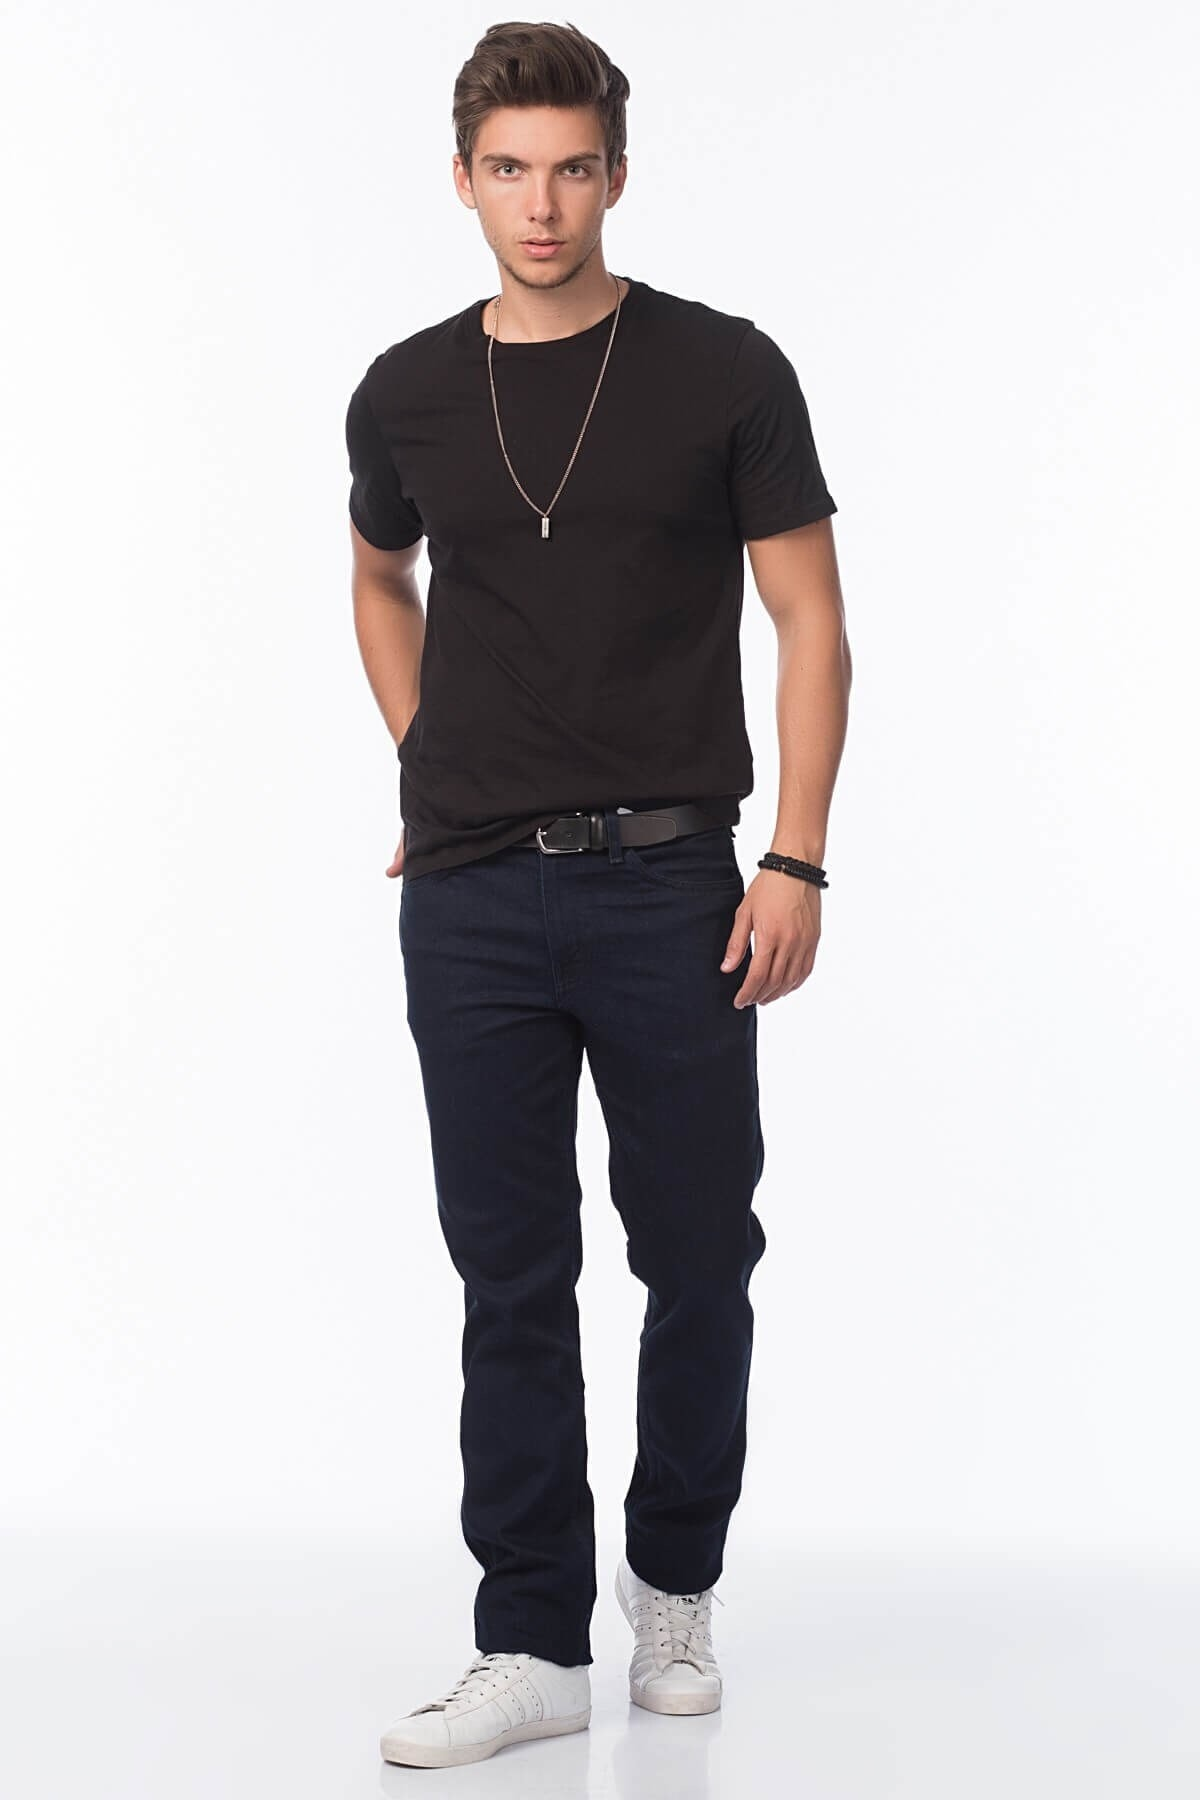 Levi's 511 L8 Slim Straight Erkek Jean Pantolon 29923-0016 1